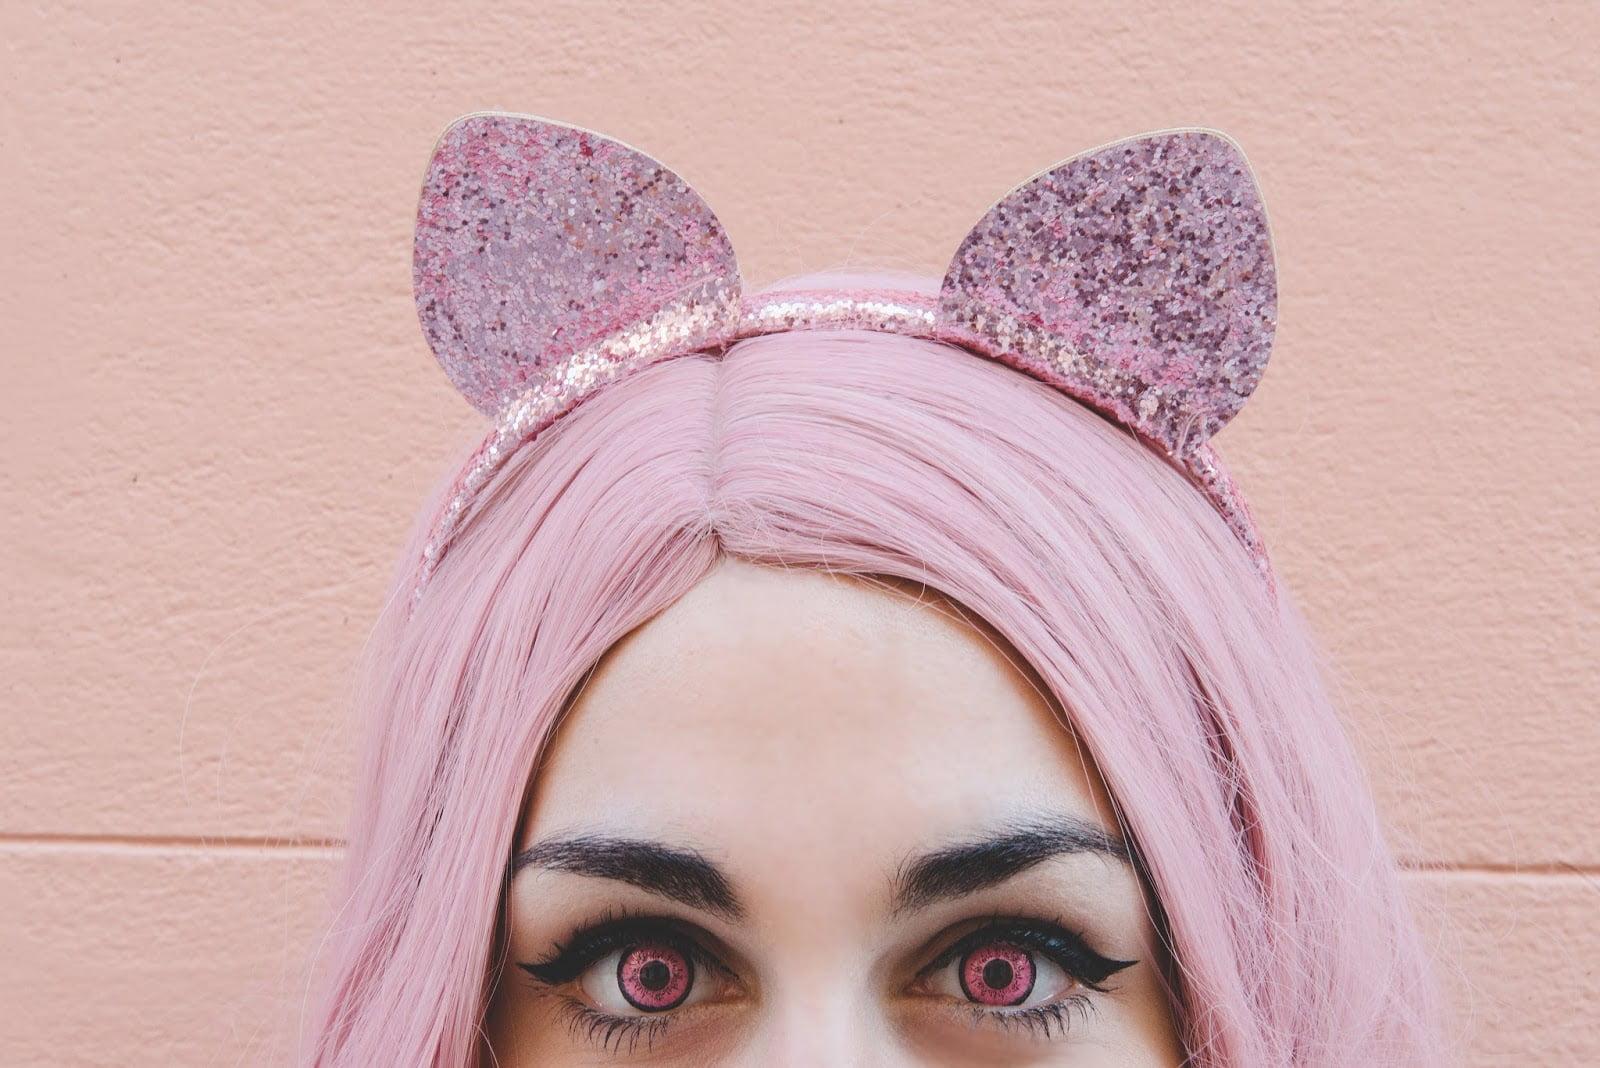 Dolly Eye Dolly Eye pink lenses